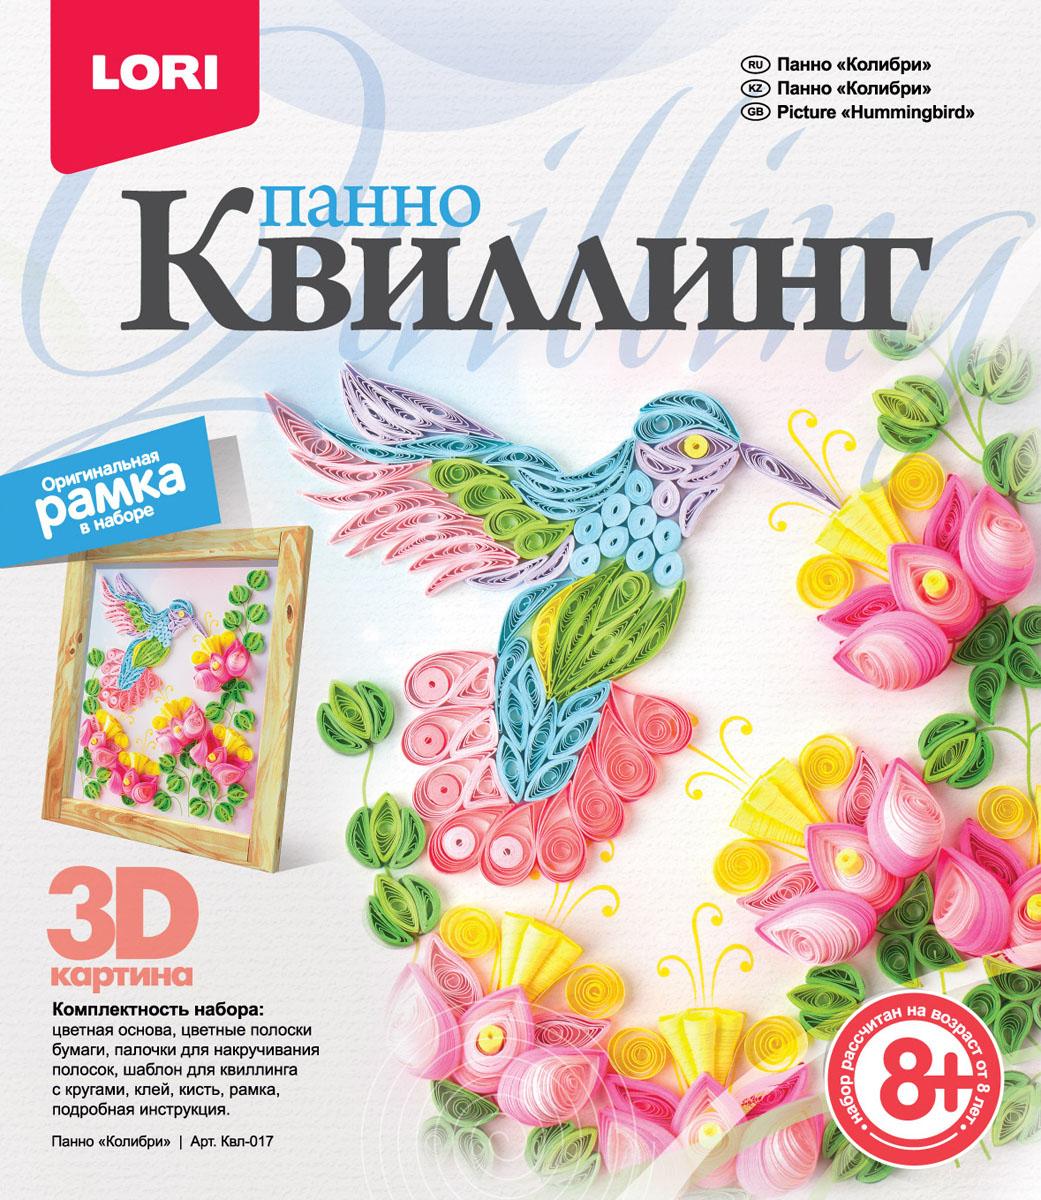 Zakazat.ru Lori Набор для квиллинга Панно Колибри